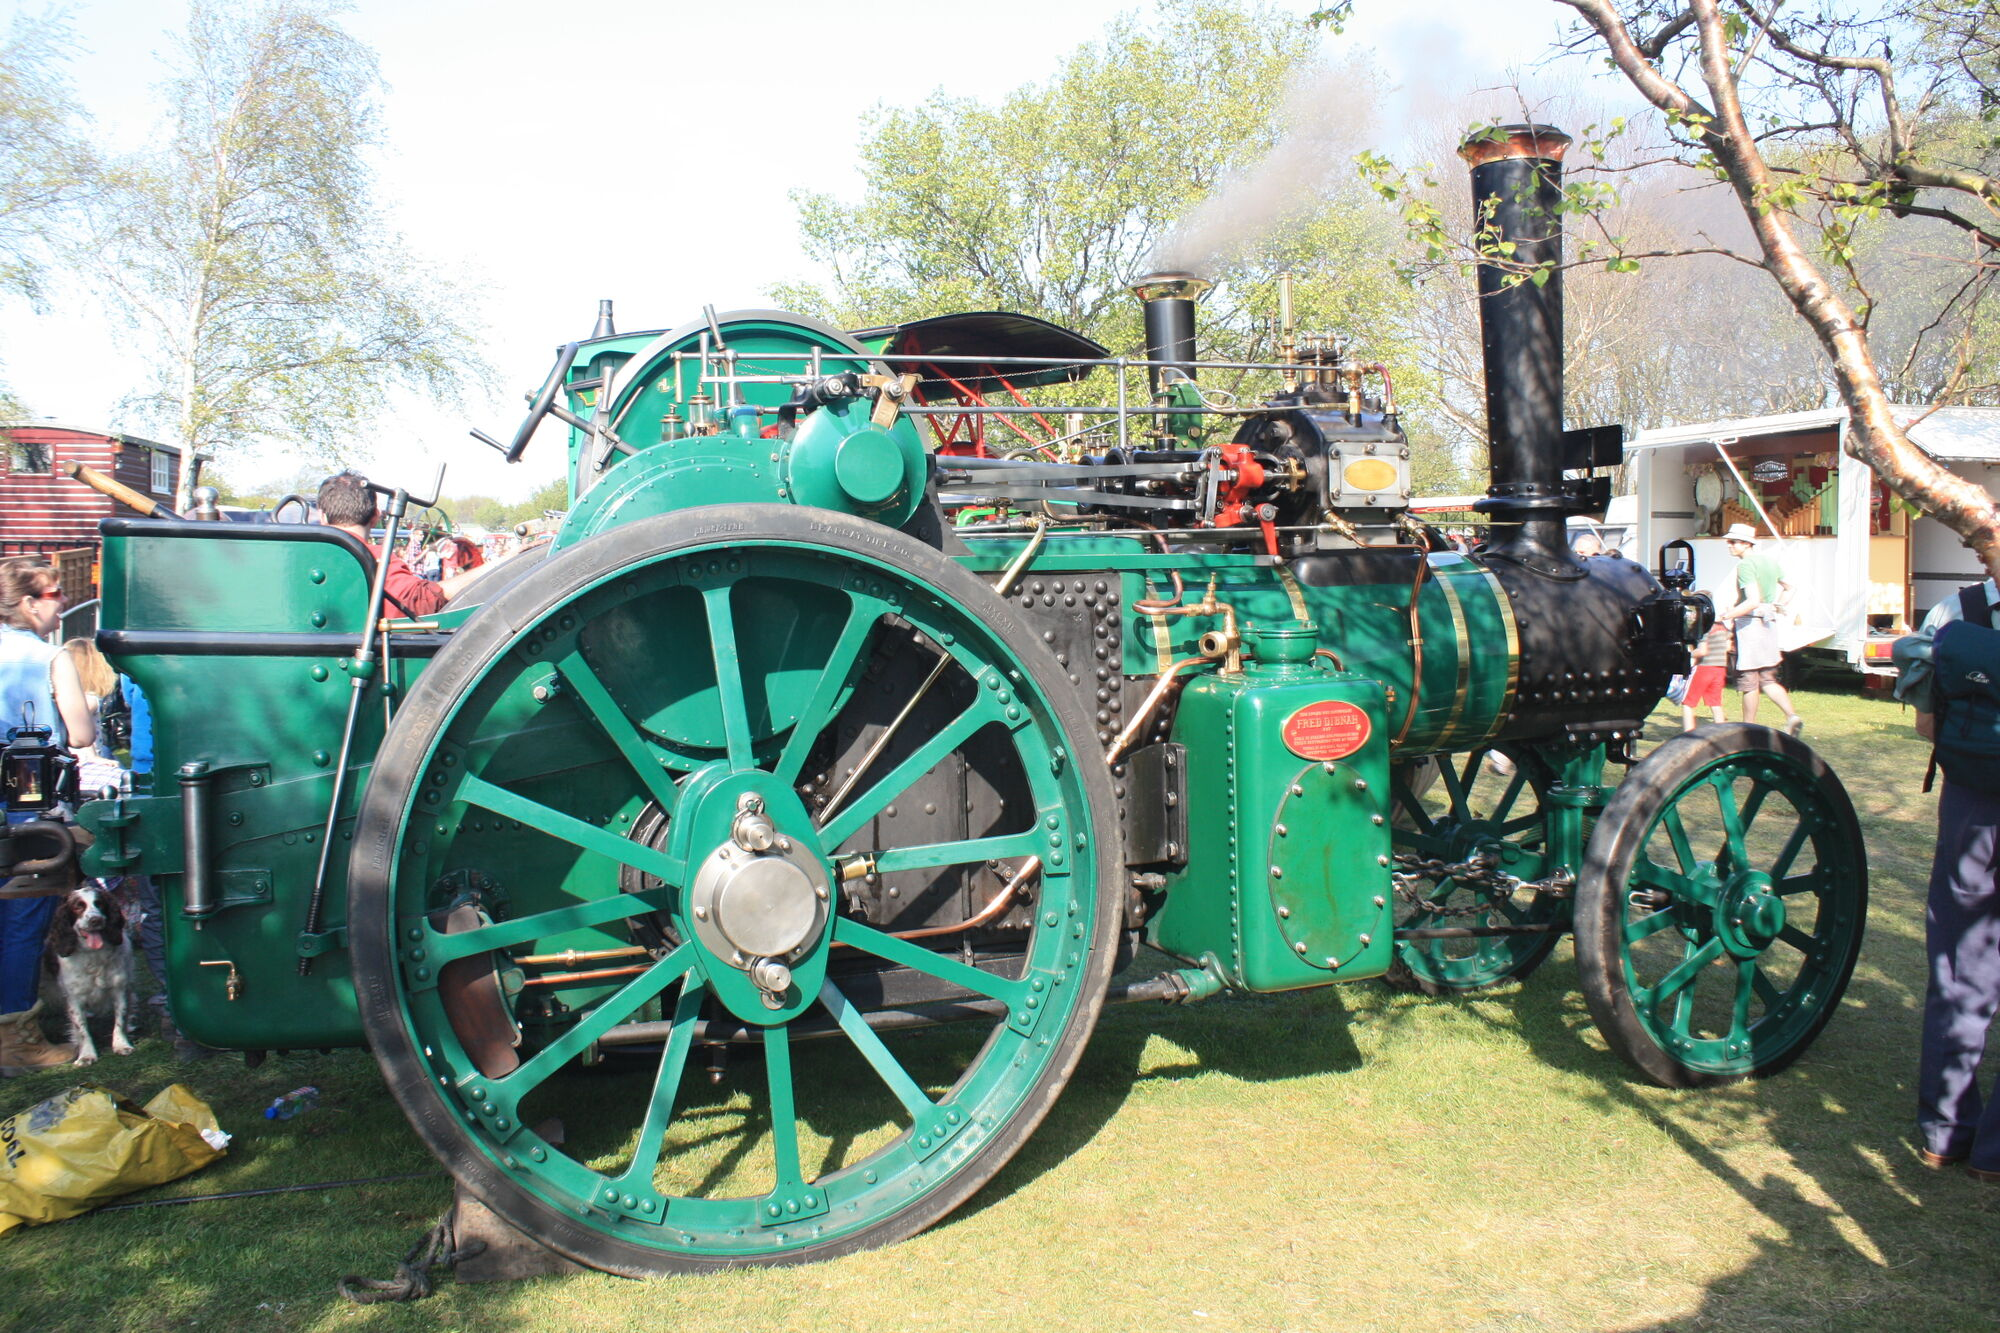 Aveling porter no 7838 tractor construction plant wiki fandom powered by wikia - Porter international wiki ...